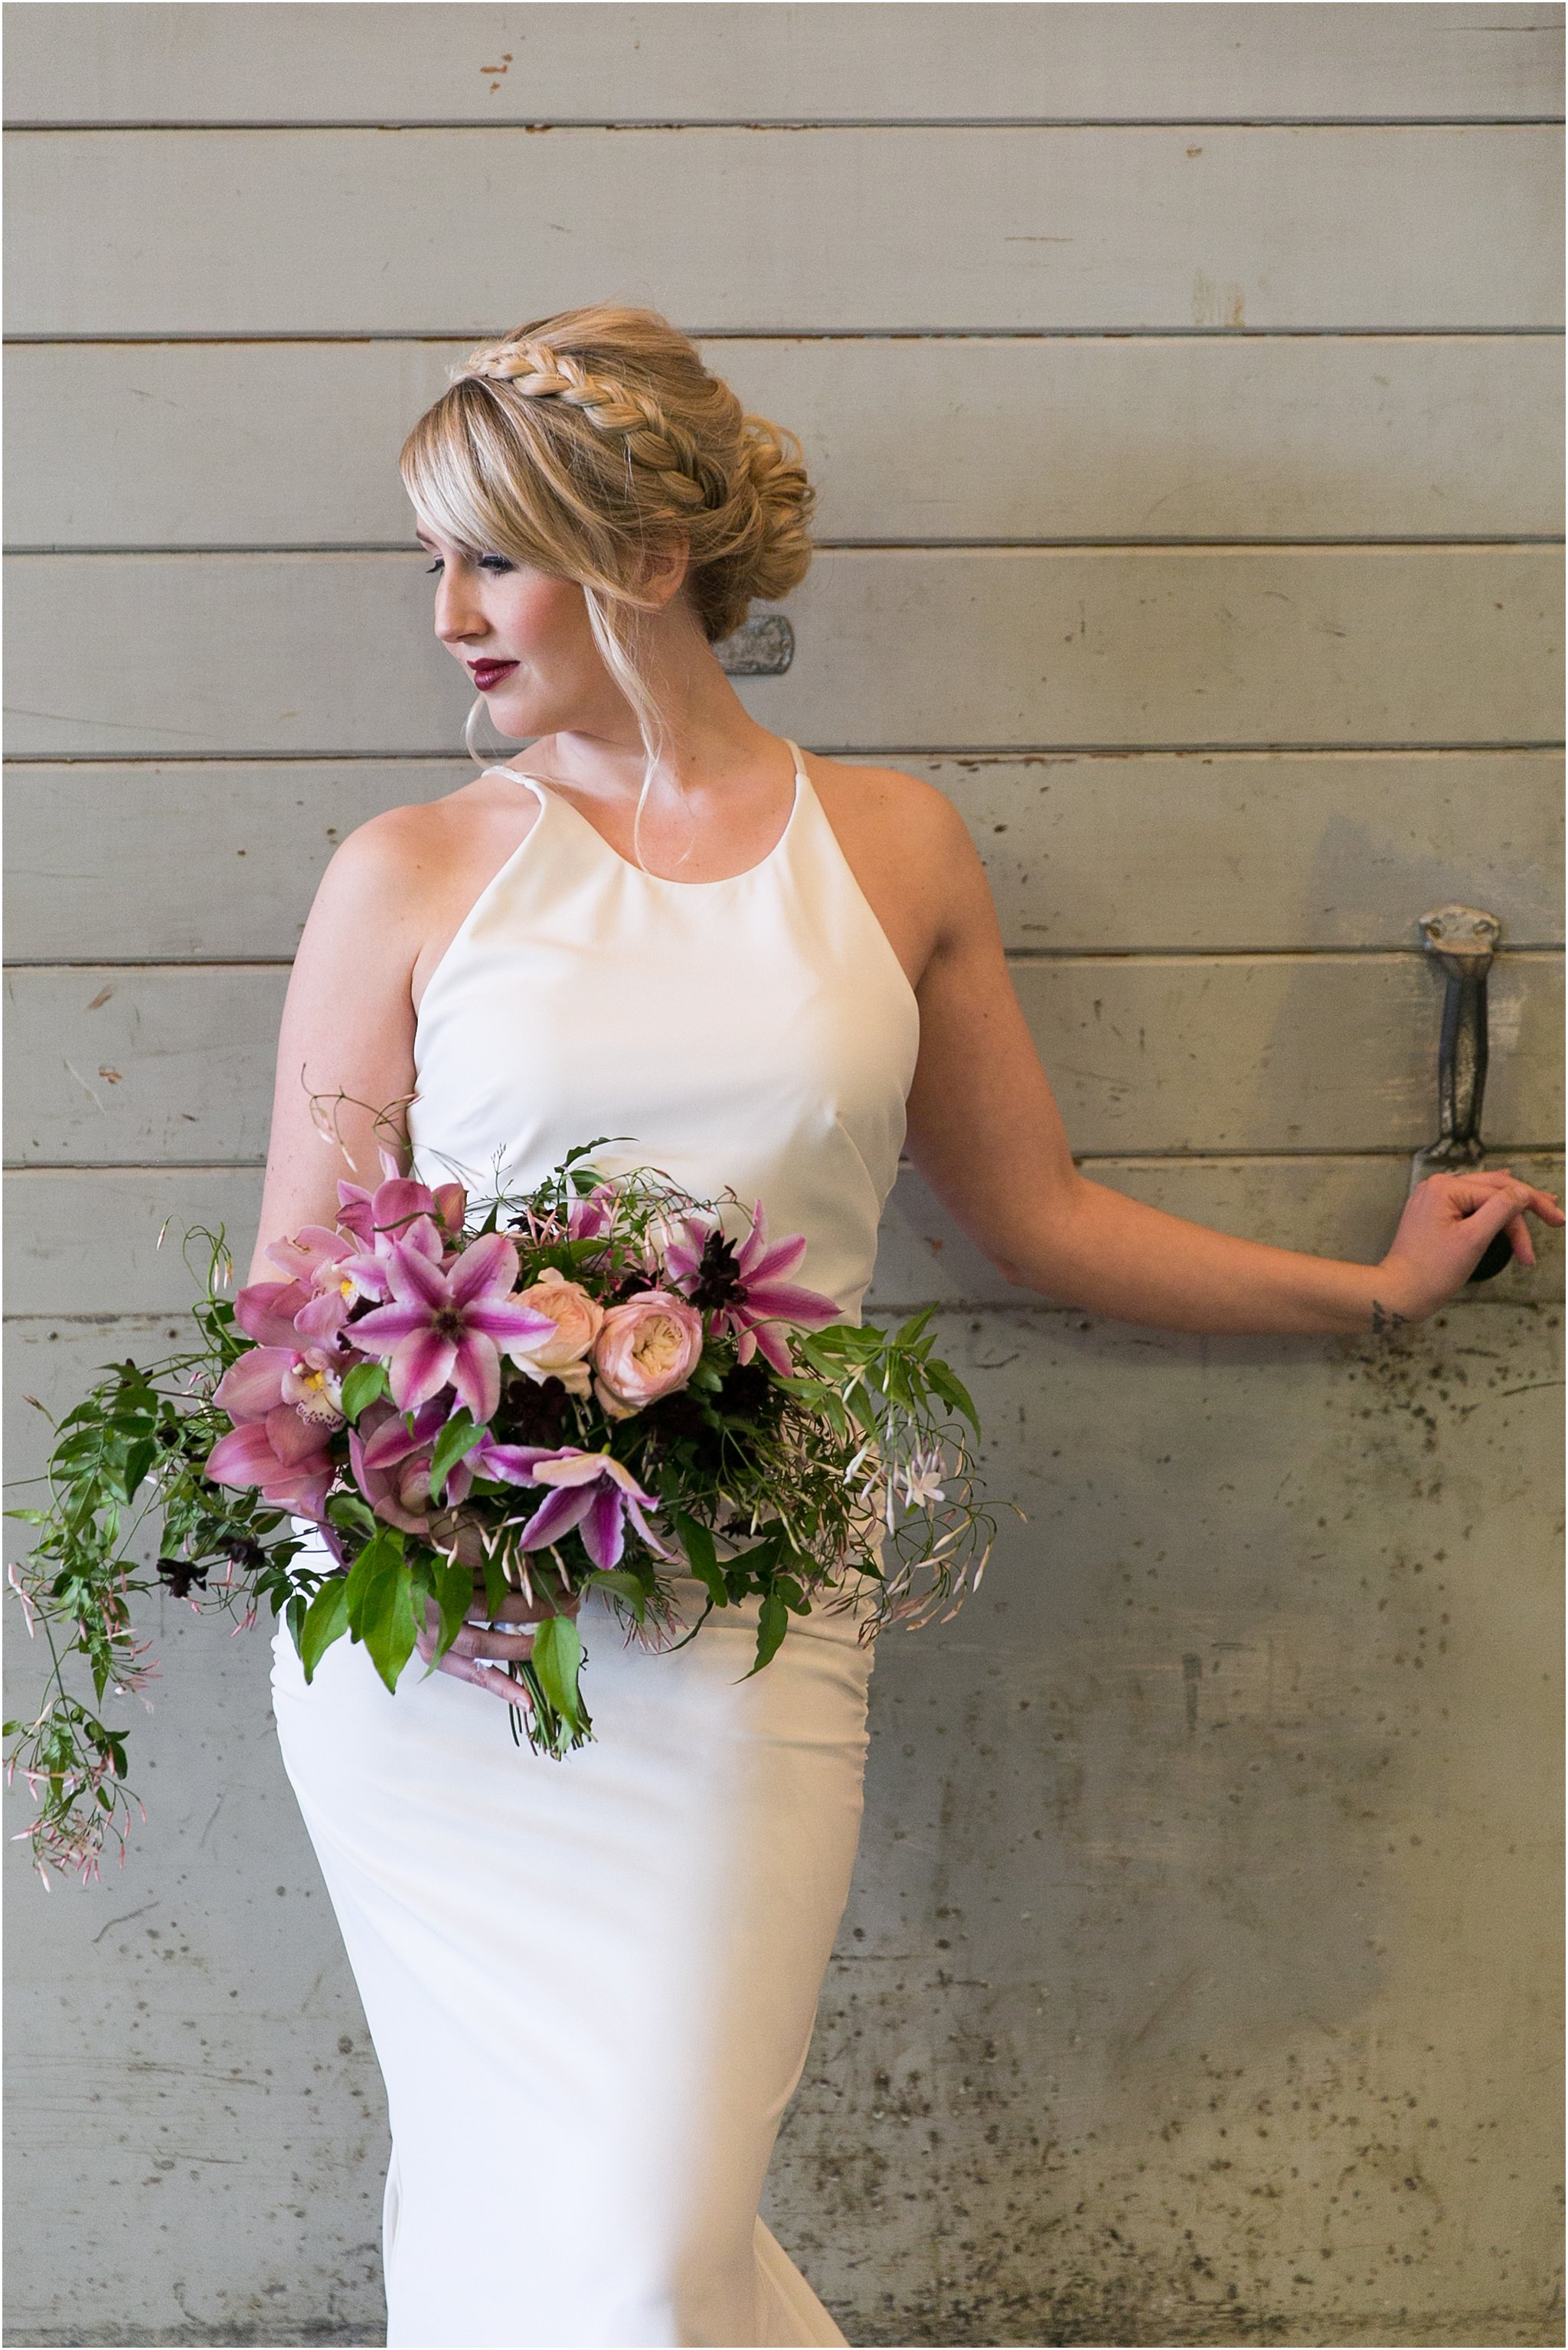 jessica_ryan_photography_oconnor_brewing_wedding_oconnor_brewing_co_norfolk_virginia_roost_flowers_blue_birds_garage__0819